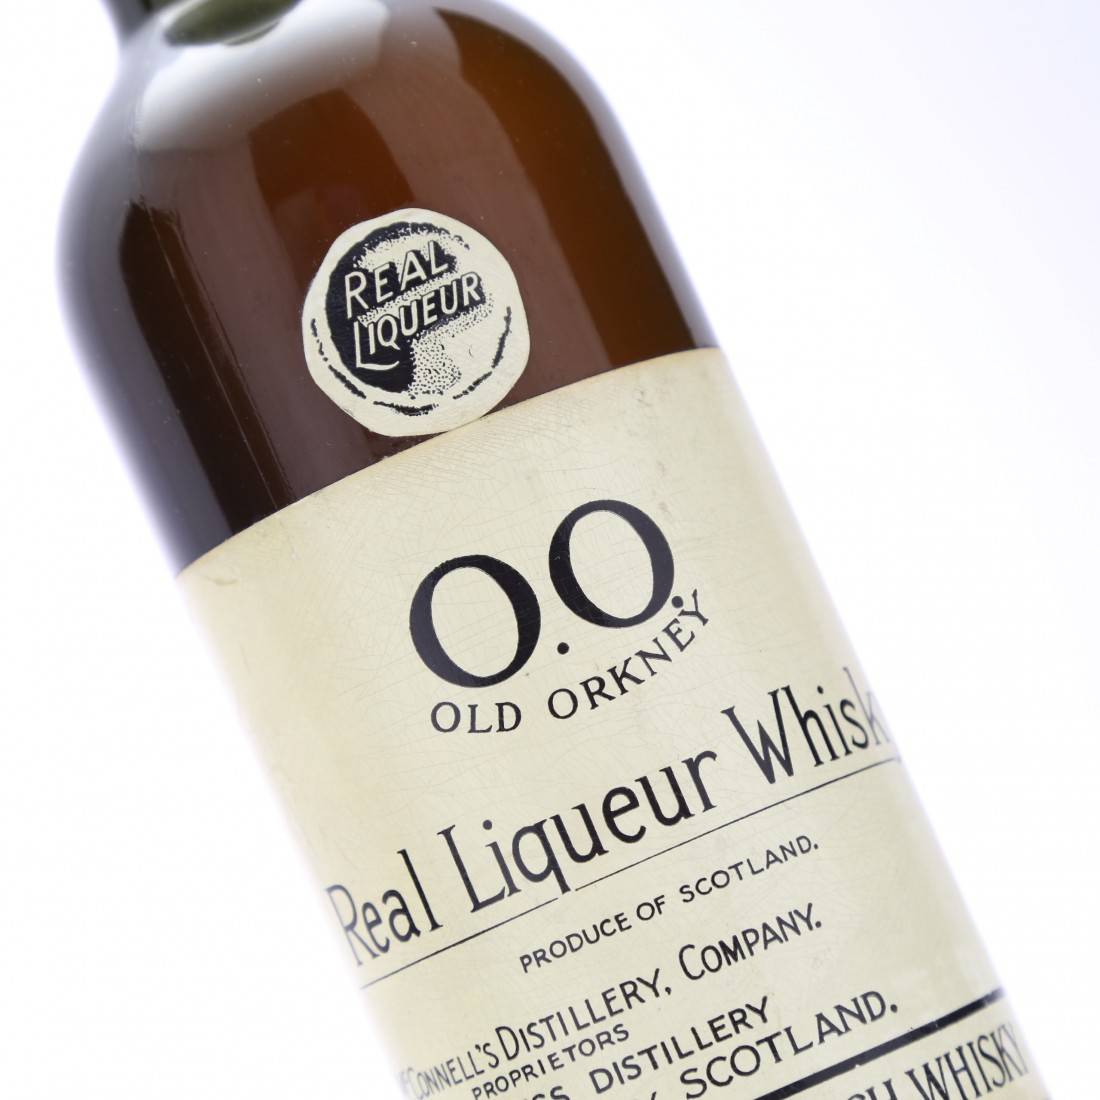 O.O. Old Orkney Real Liqueur Whisky circa 1940s